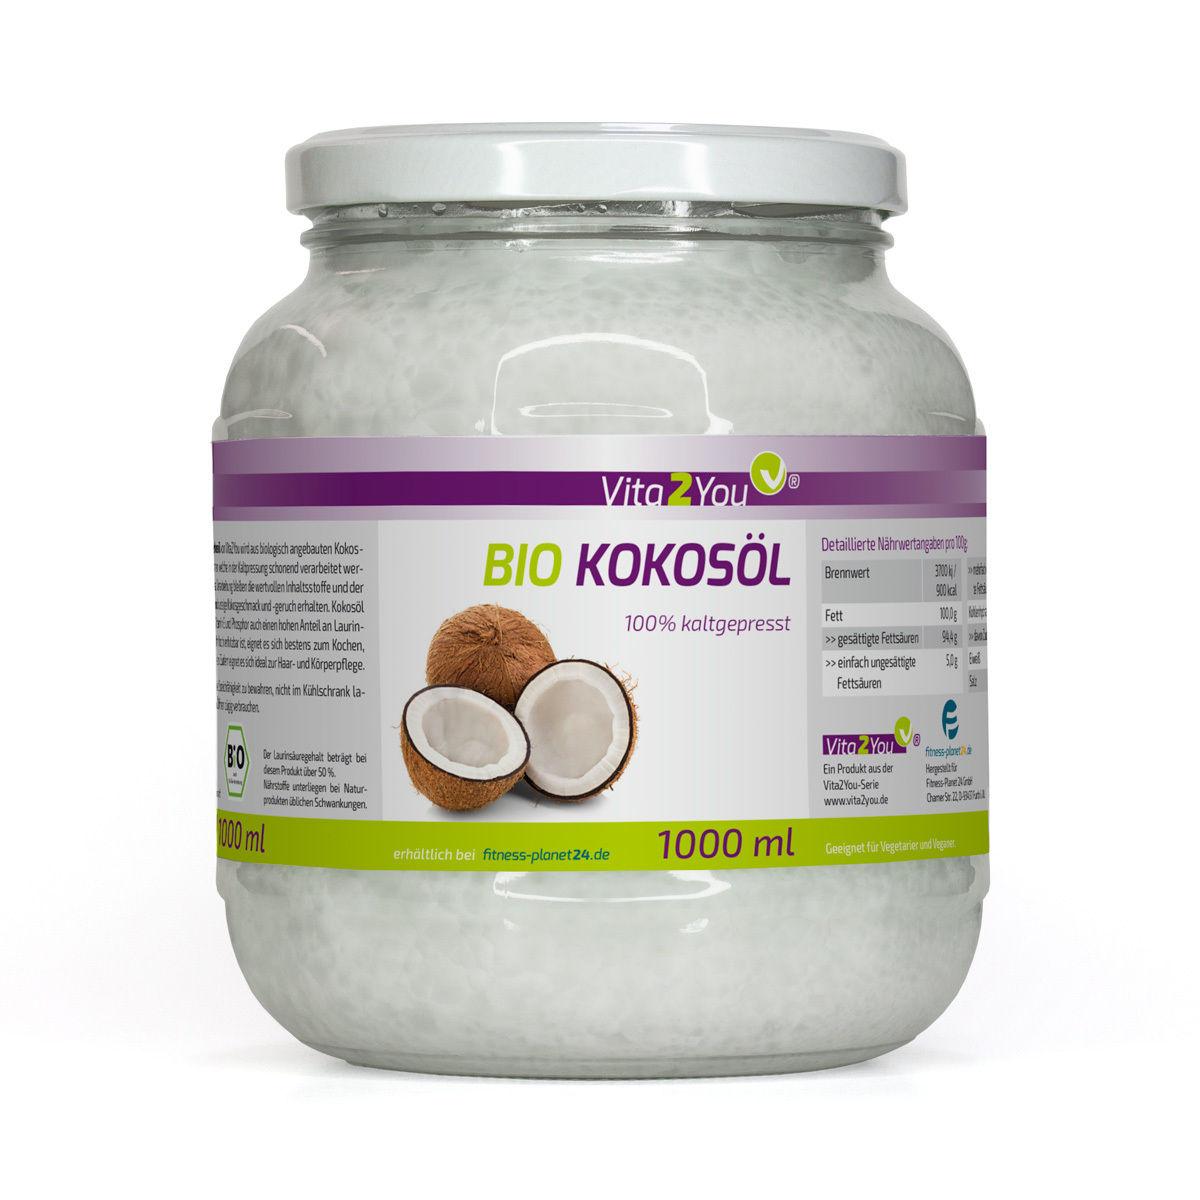 Vita2You BIO Kokosöl 1000ml - Kaltgepresst und Naturbelassen - Premium Qualität